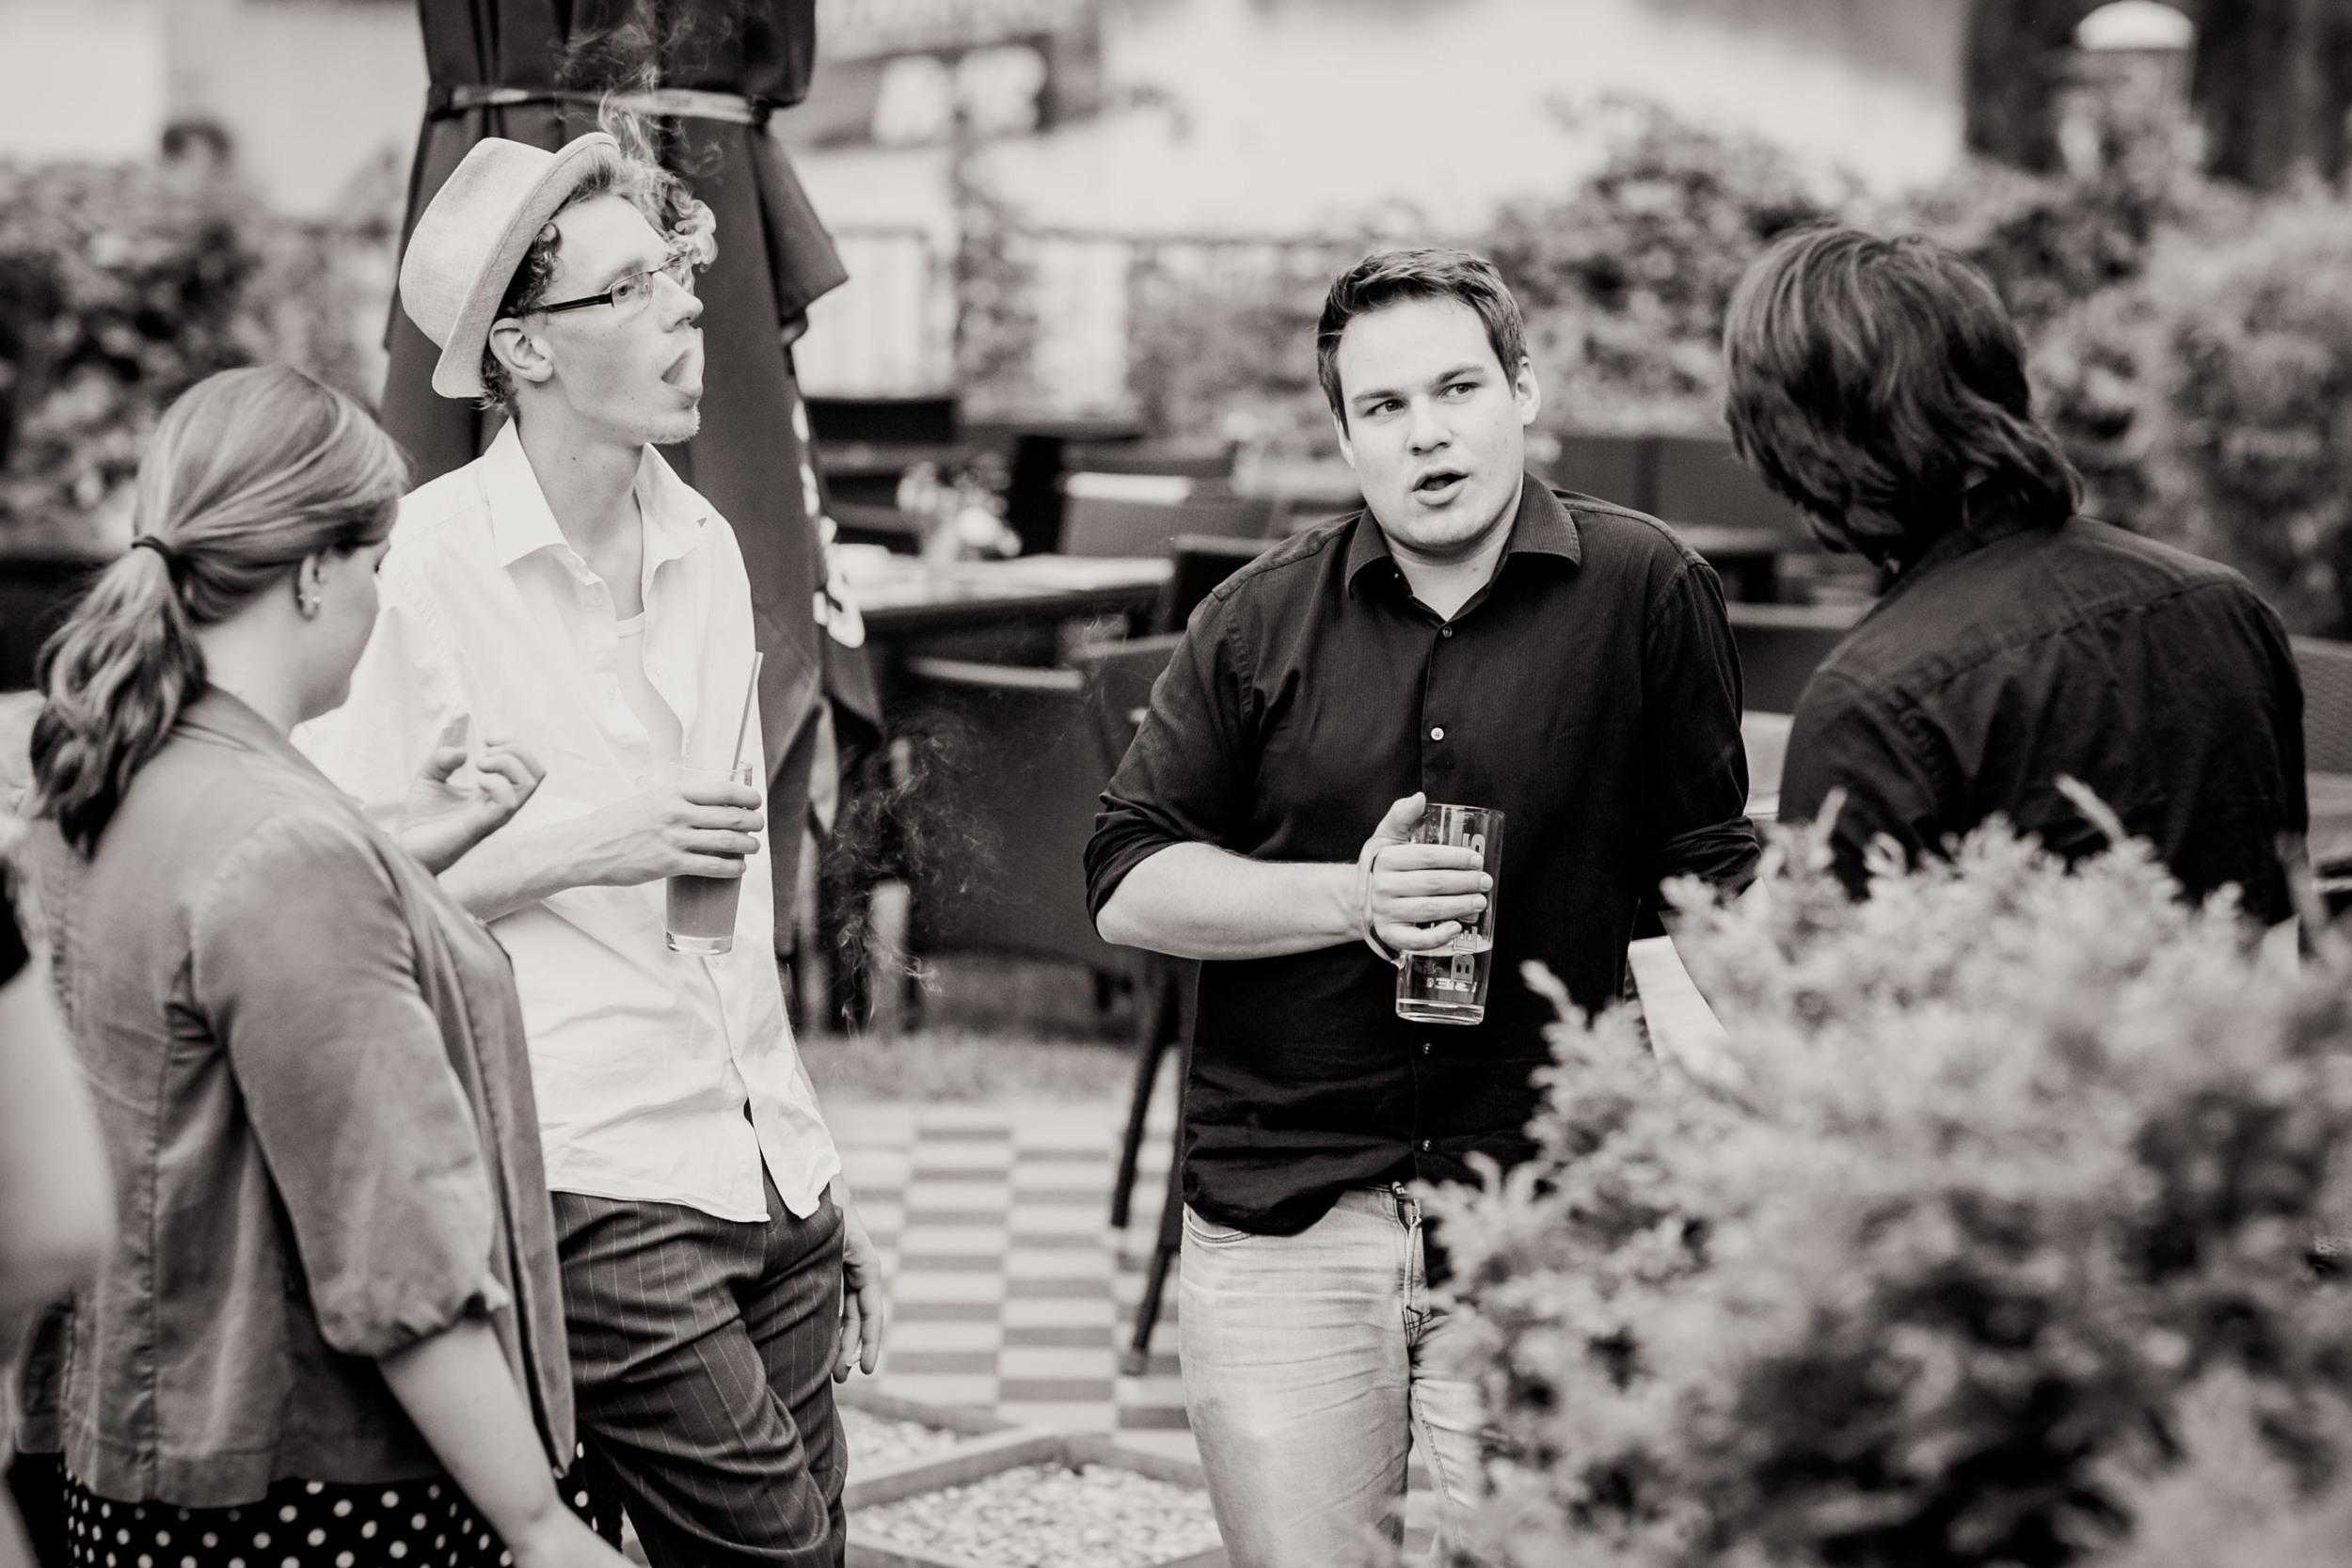 Berlin Hochzeitsfotografie_Fran Burrows-792.jpg